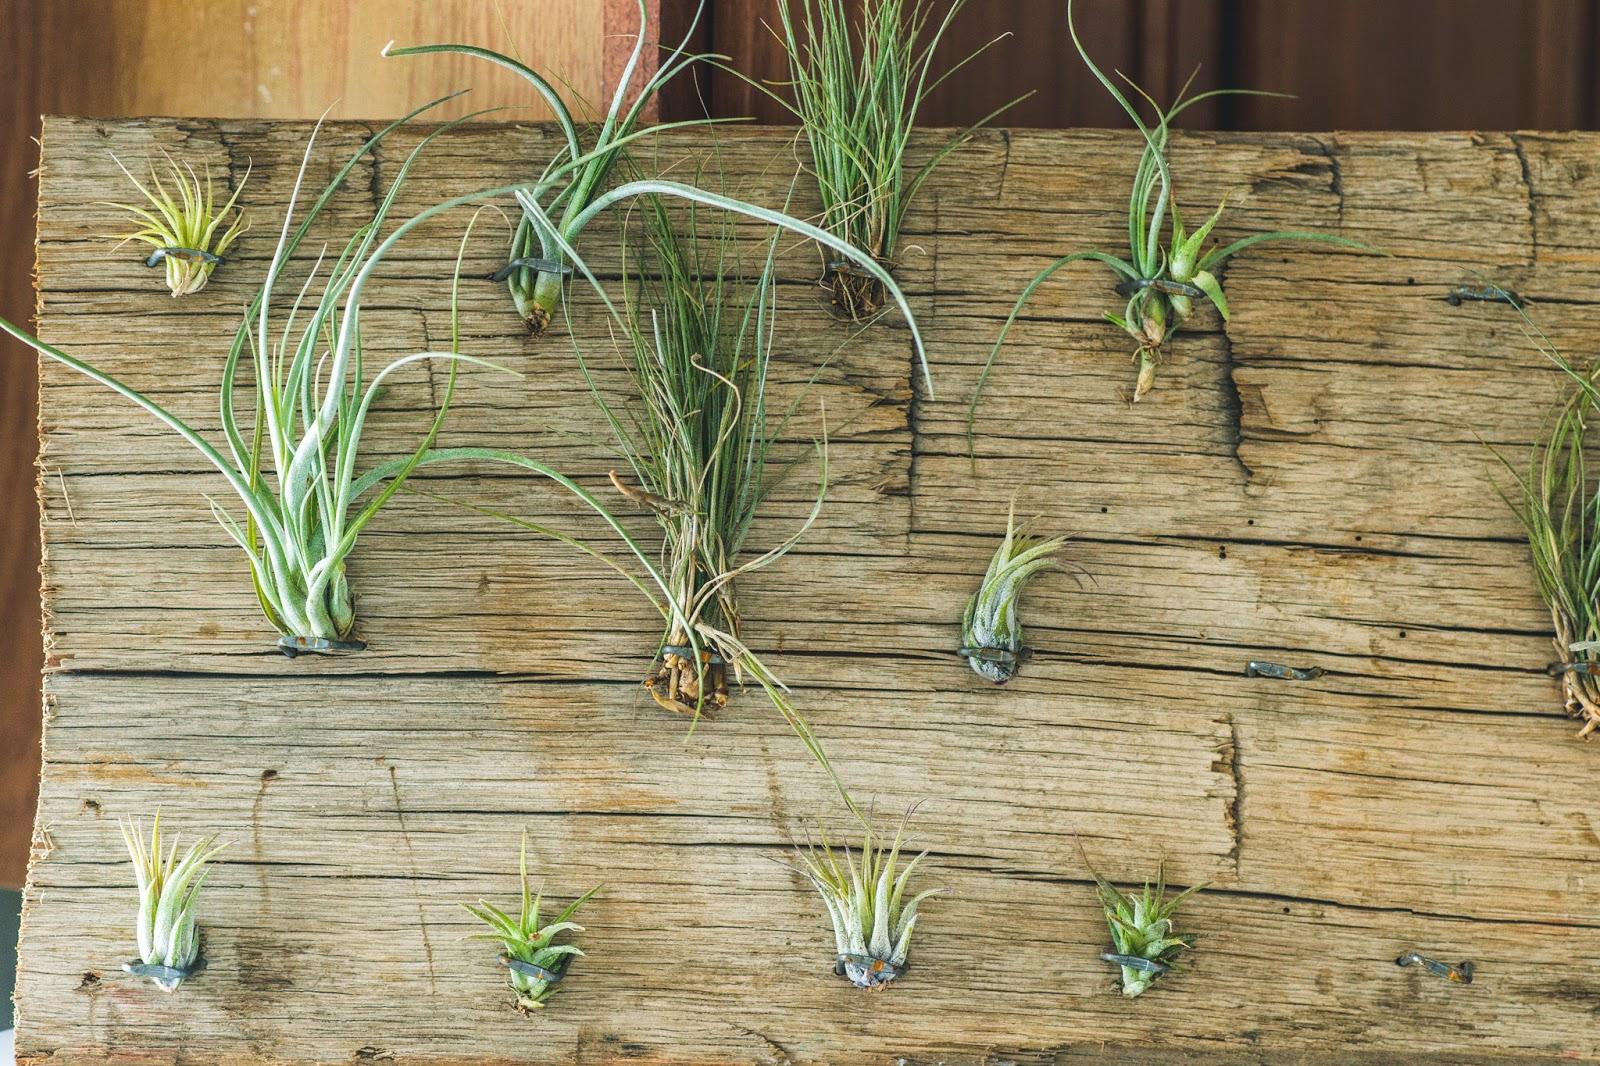 plants0027.jpg